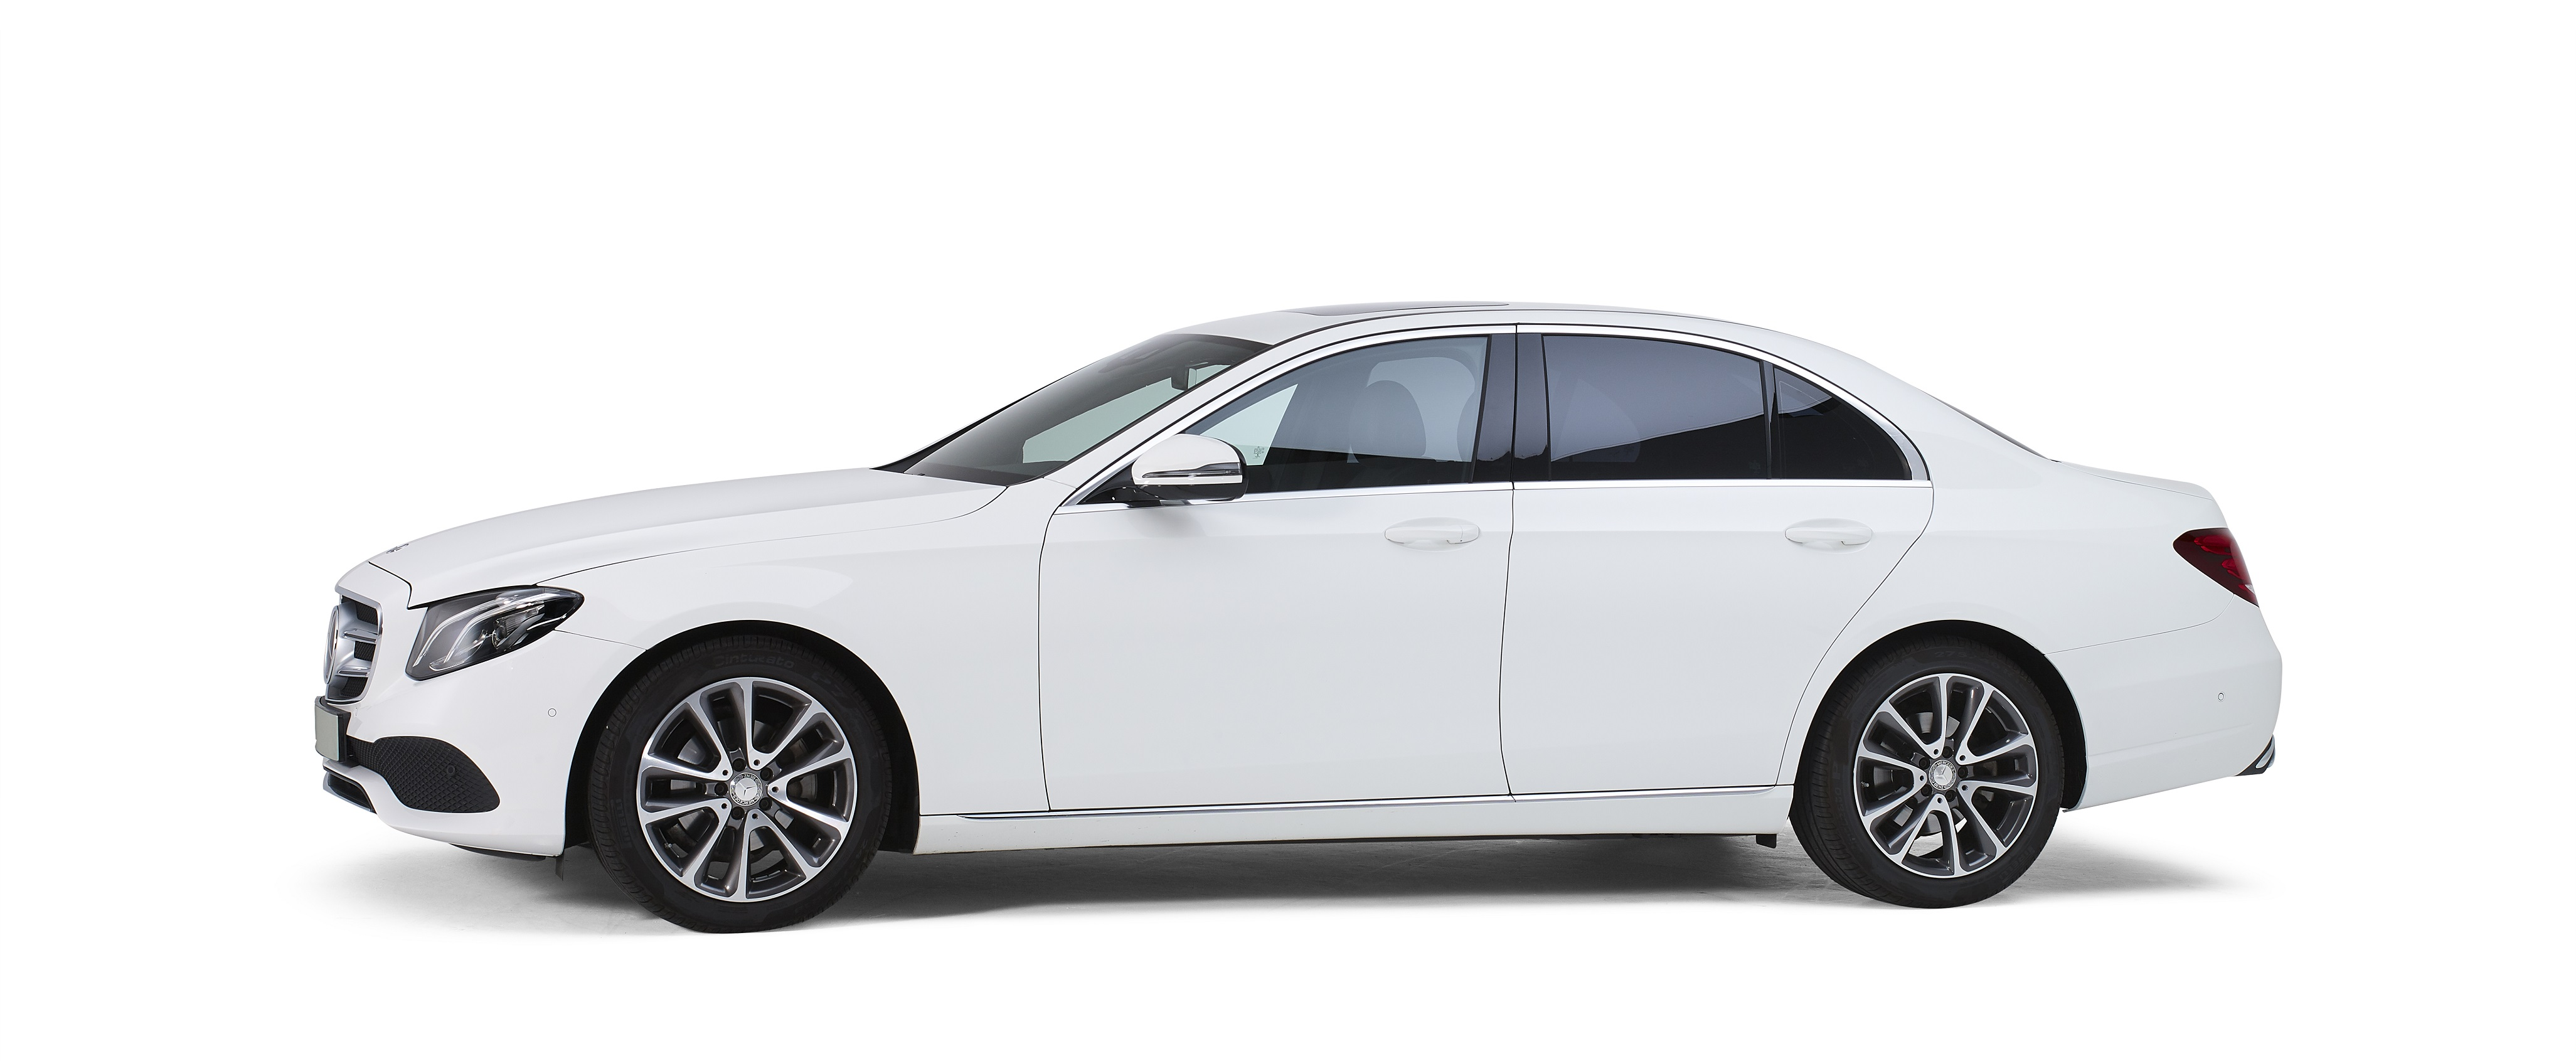 Mercedes wit – 4 Persoons Volgauto